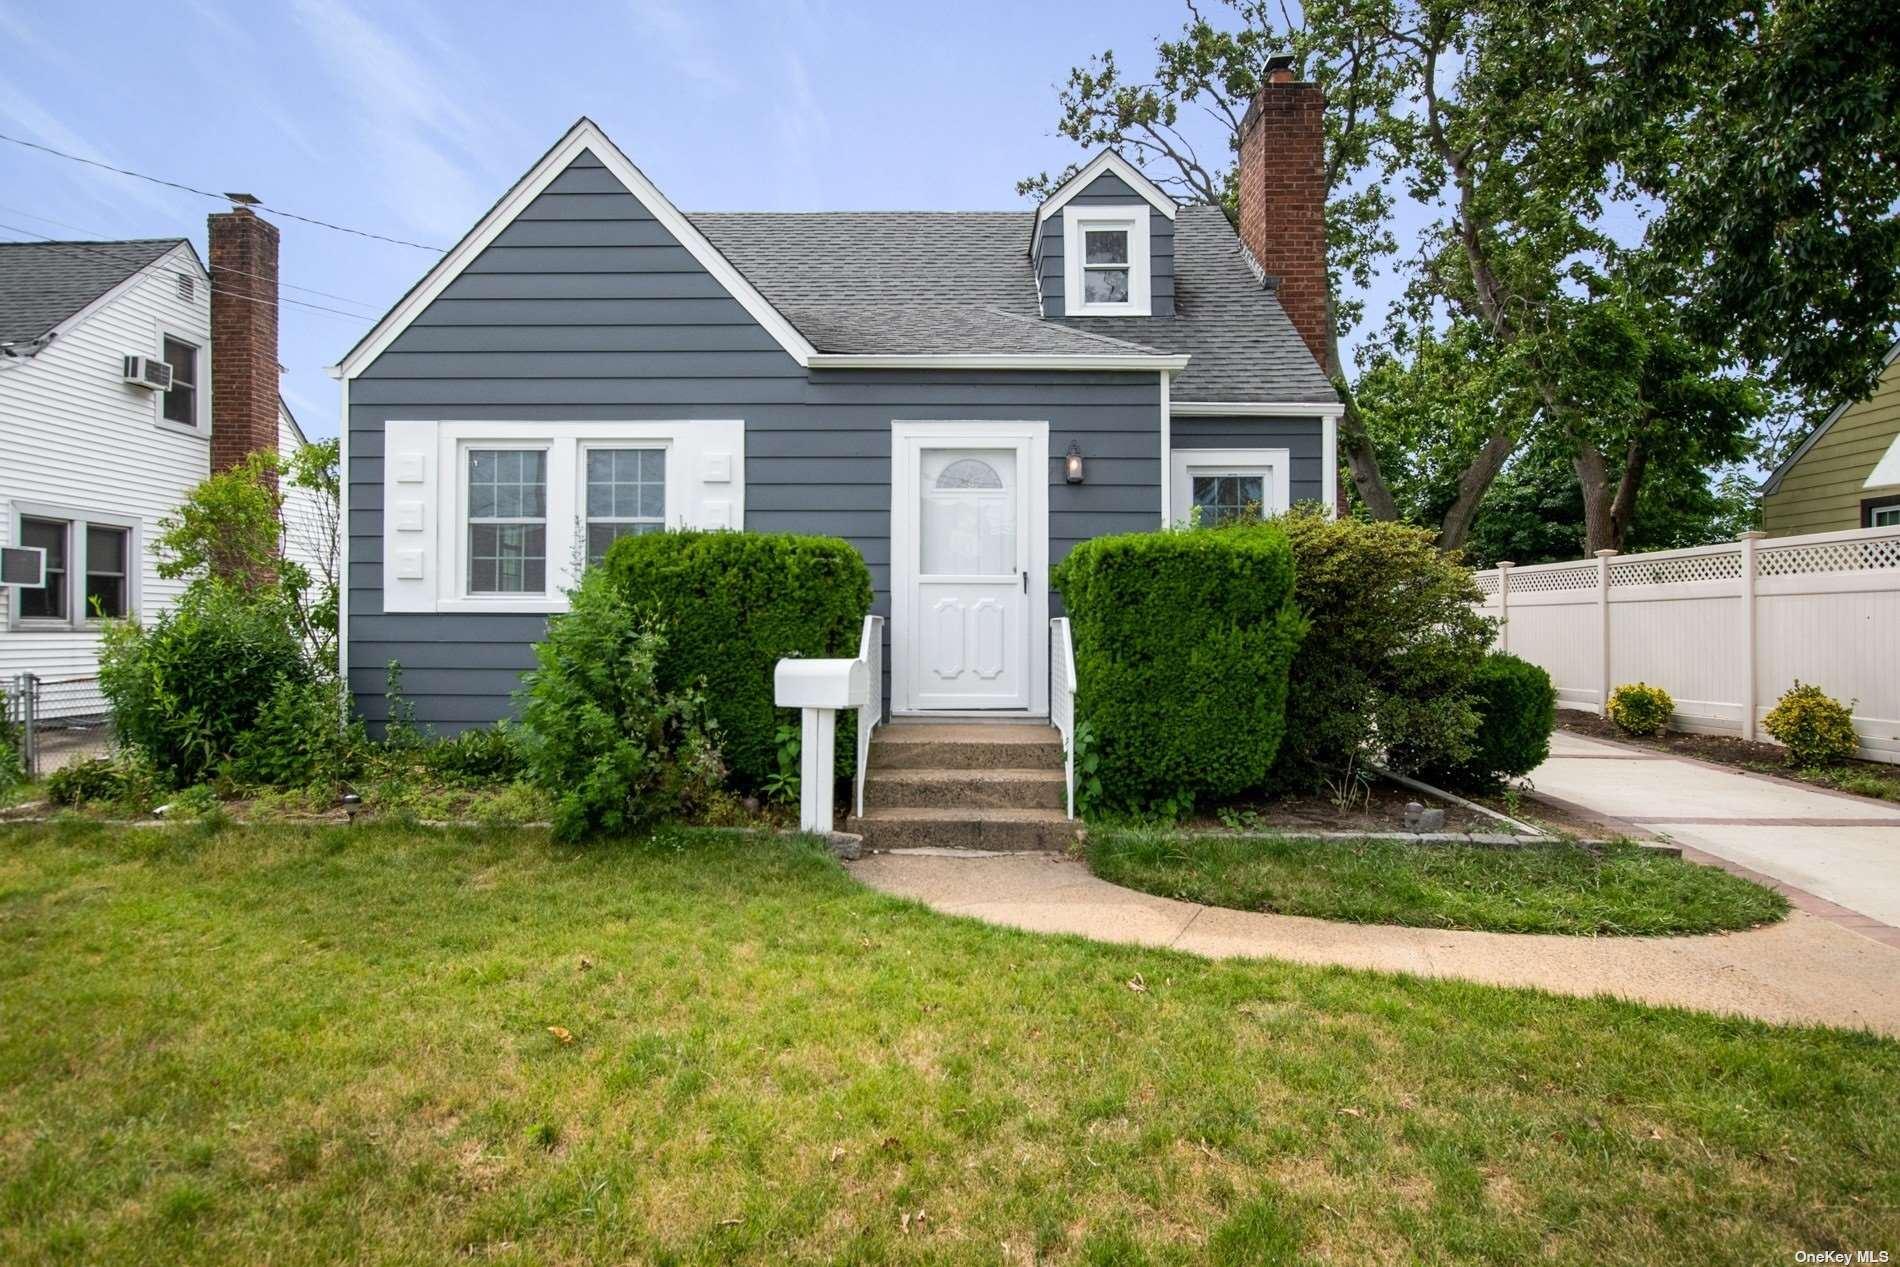 206 Stephen Street, North Bellmore, NY 11710 - MLS#: 3324550